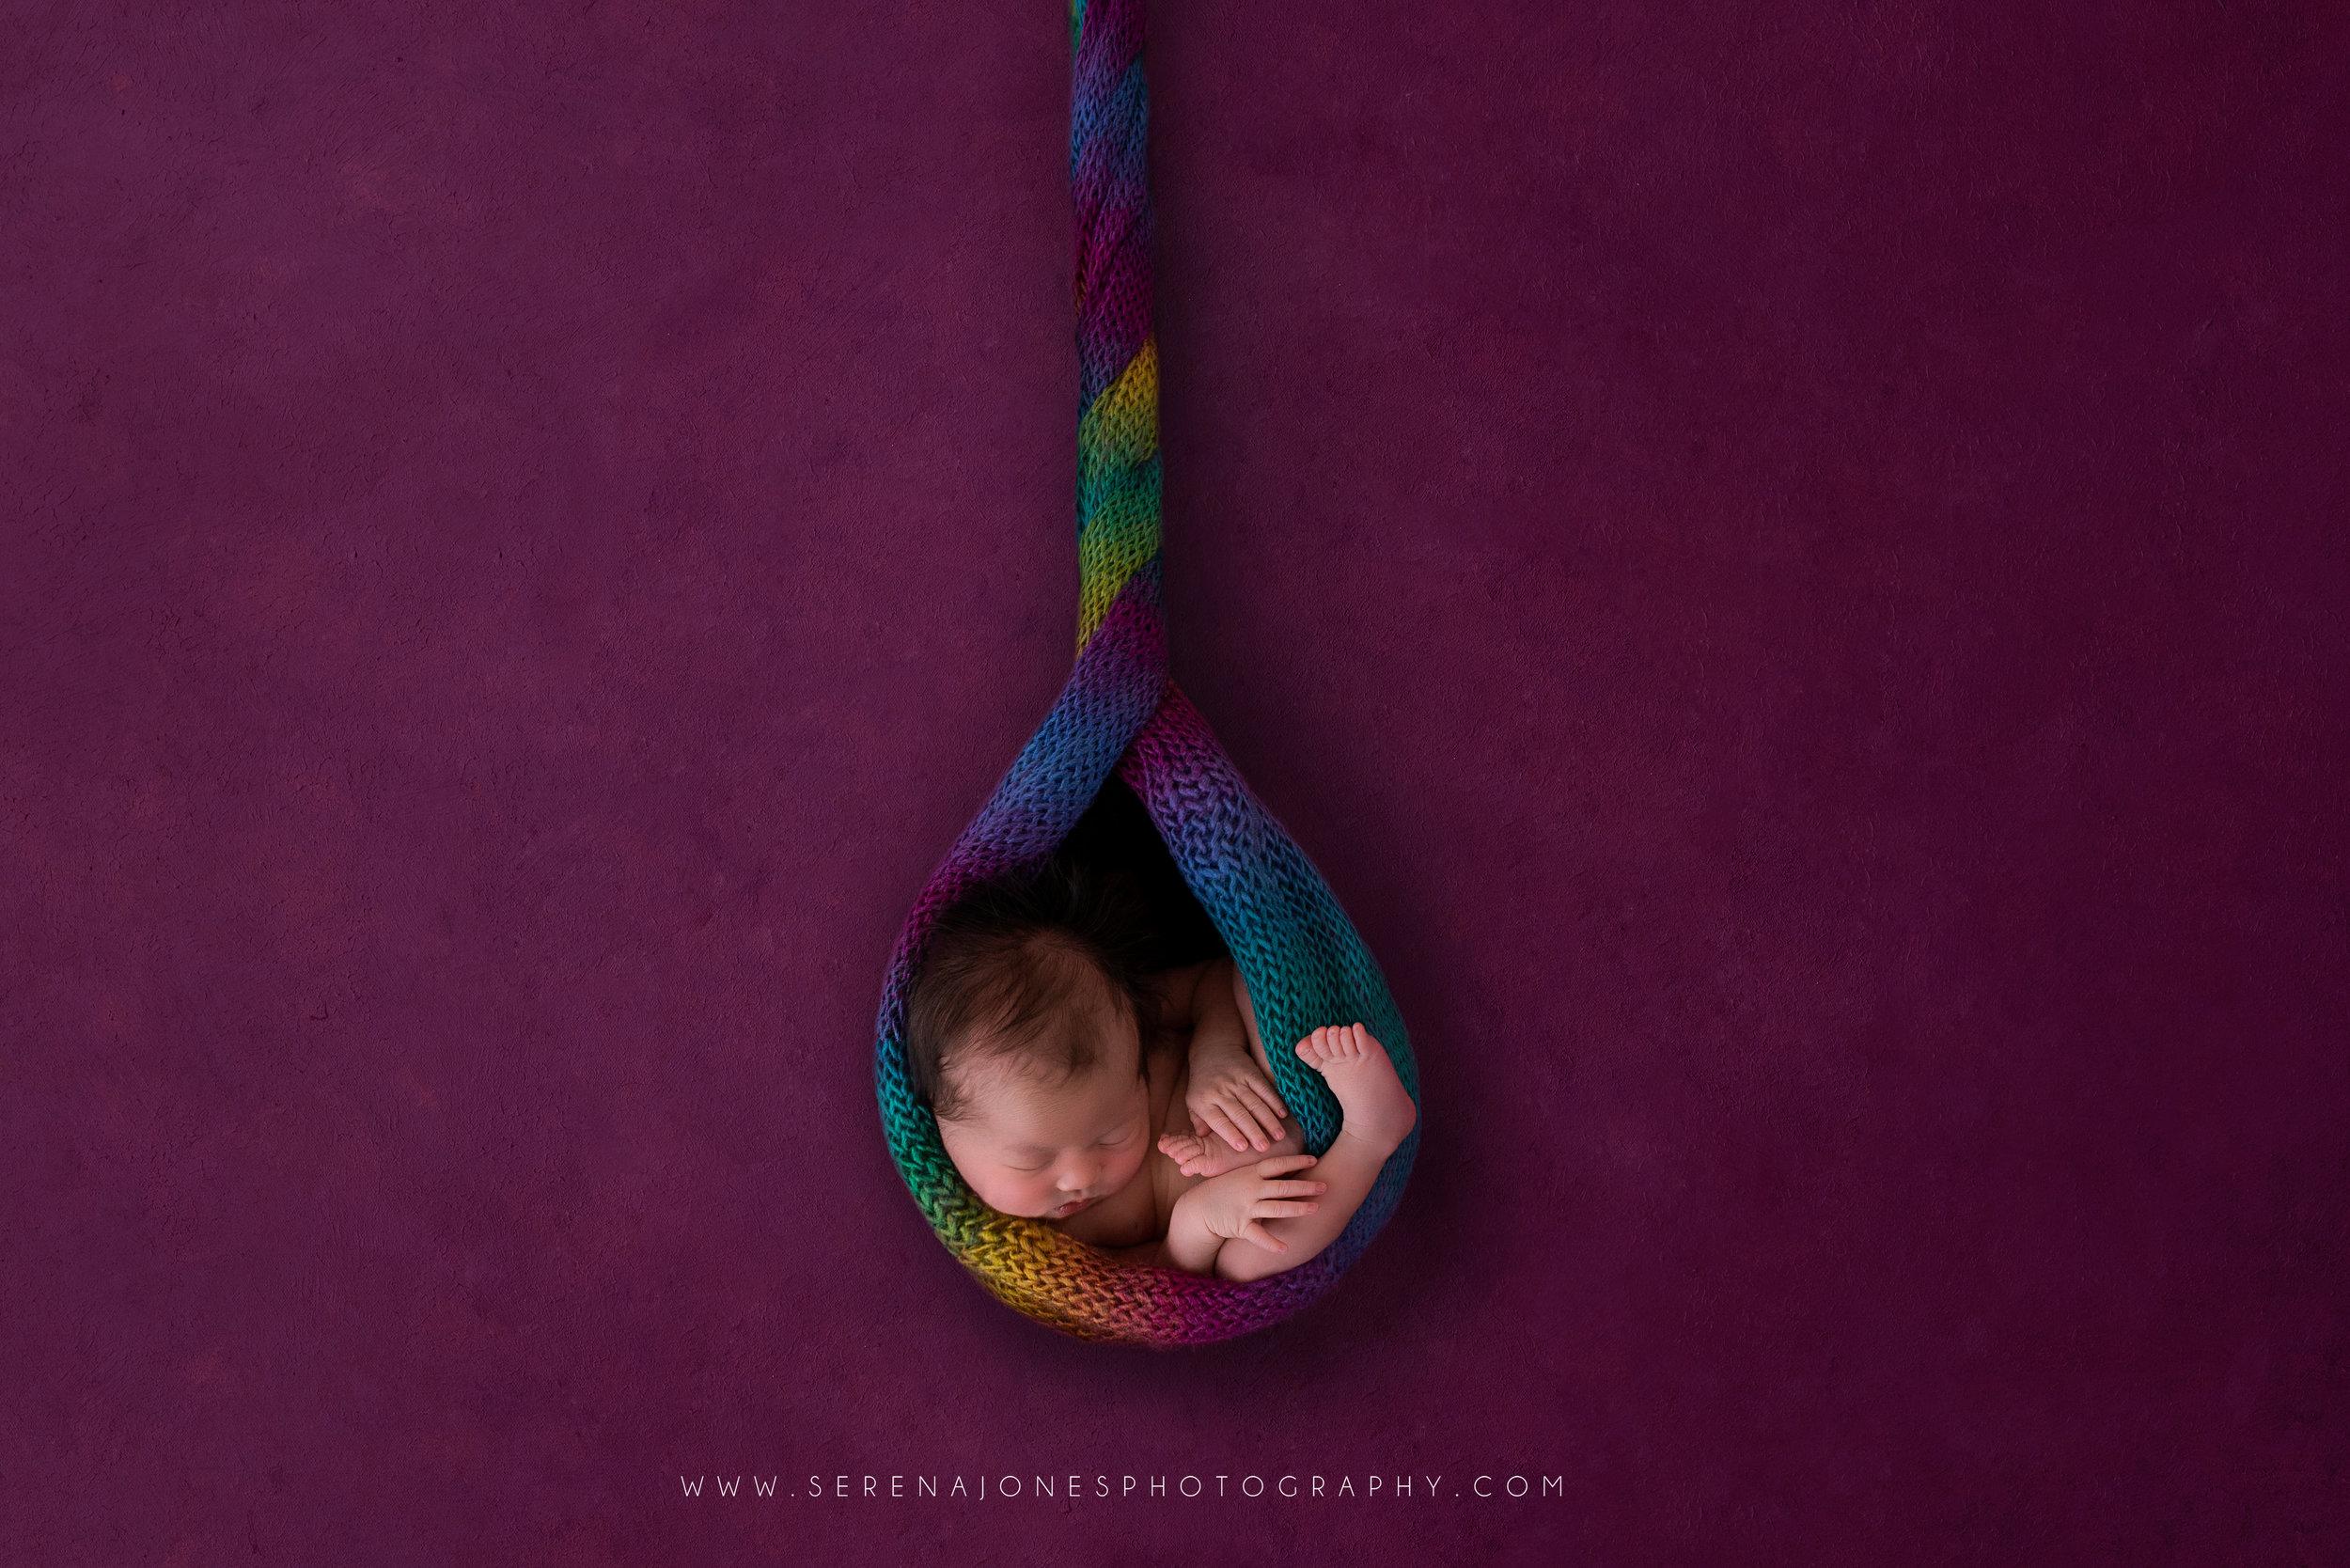 Serena Jones Photography - Sophia Gracielle Irawan - 12 FB.jpg